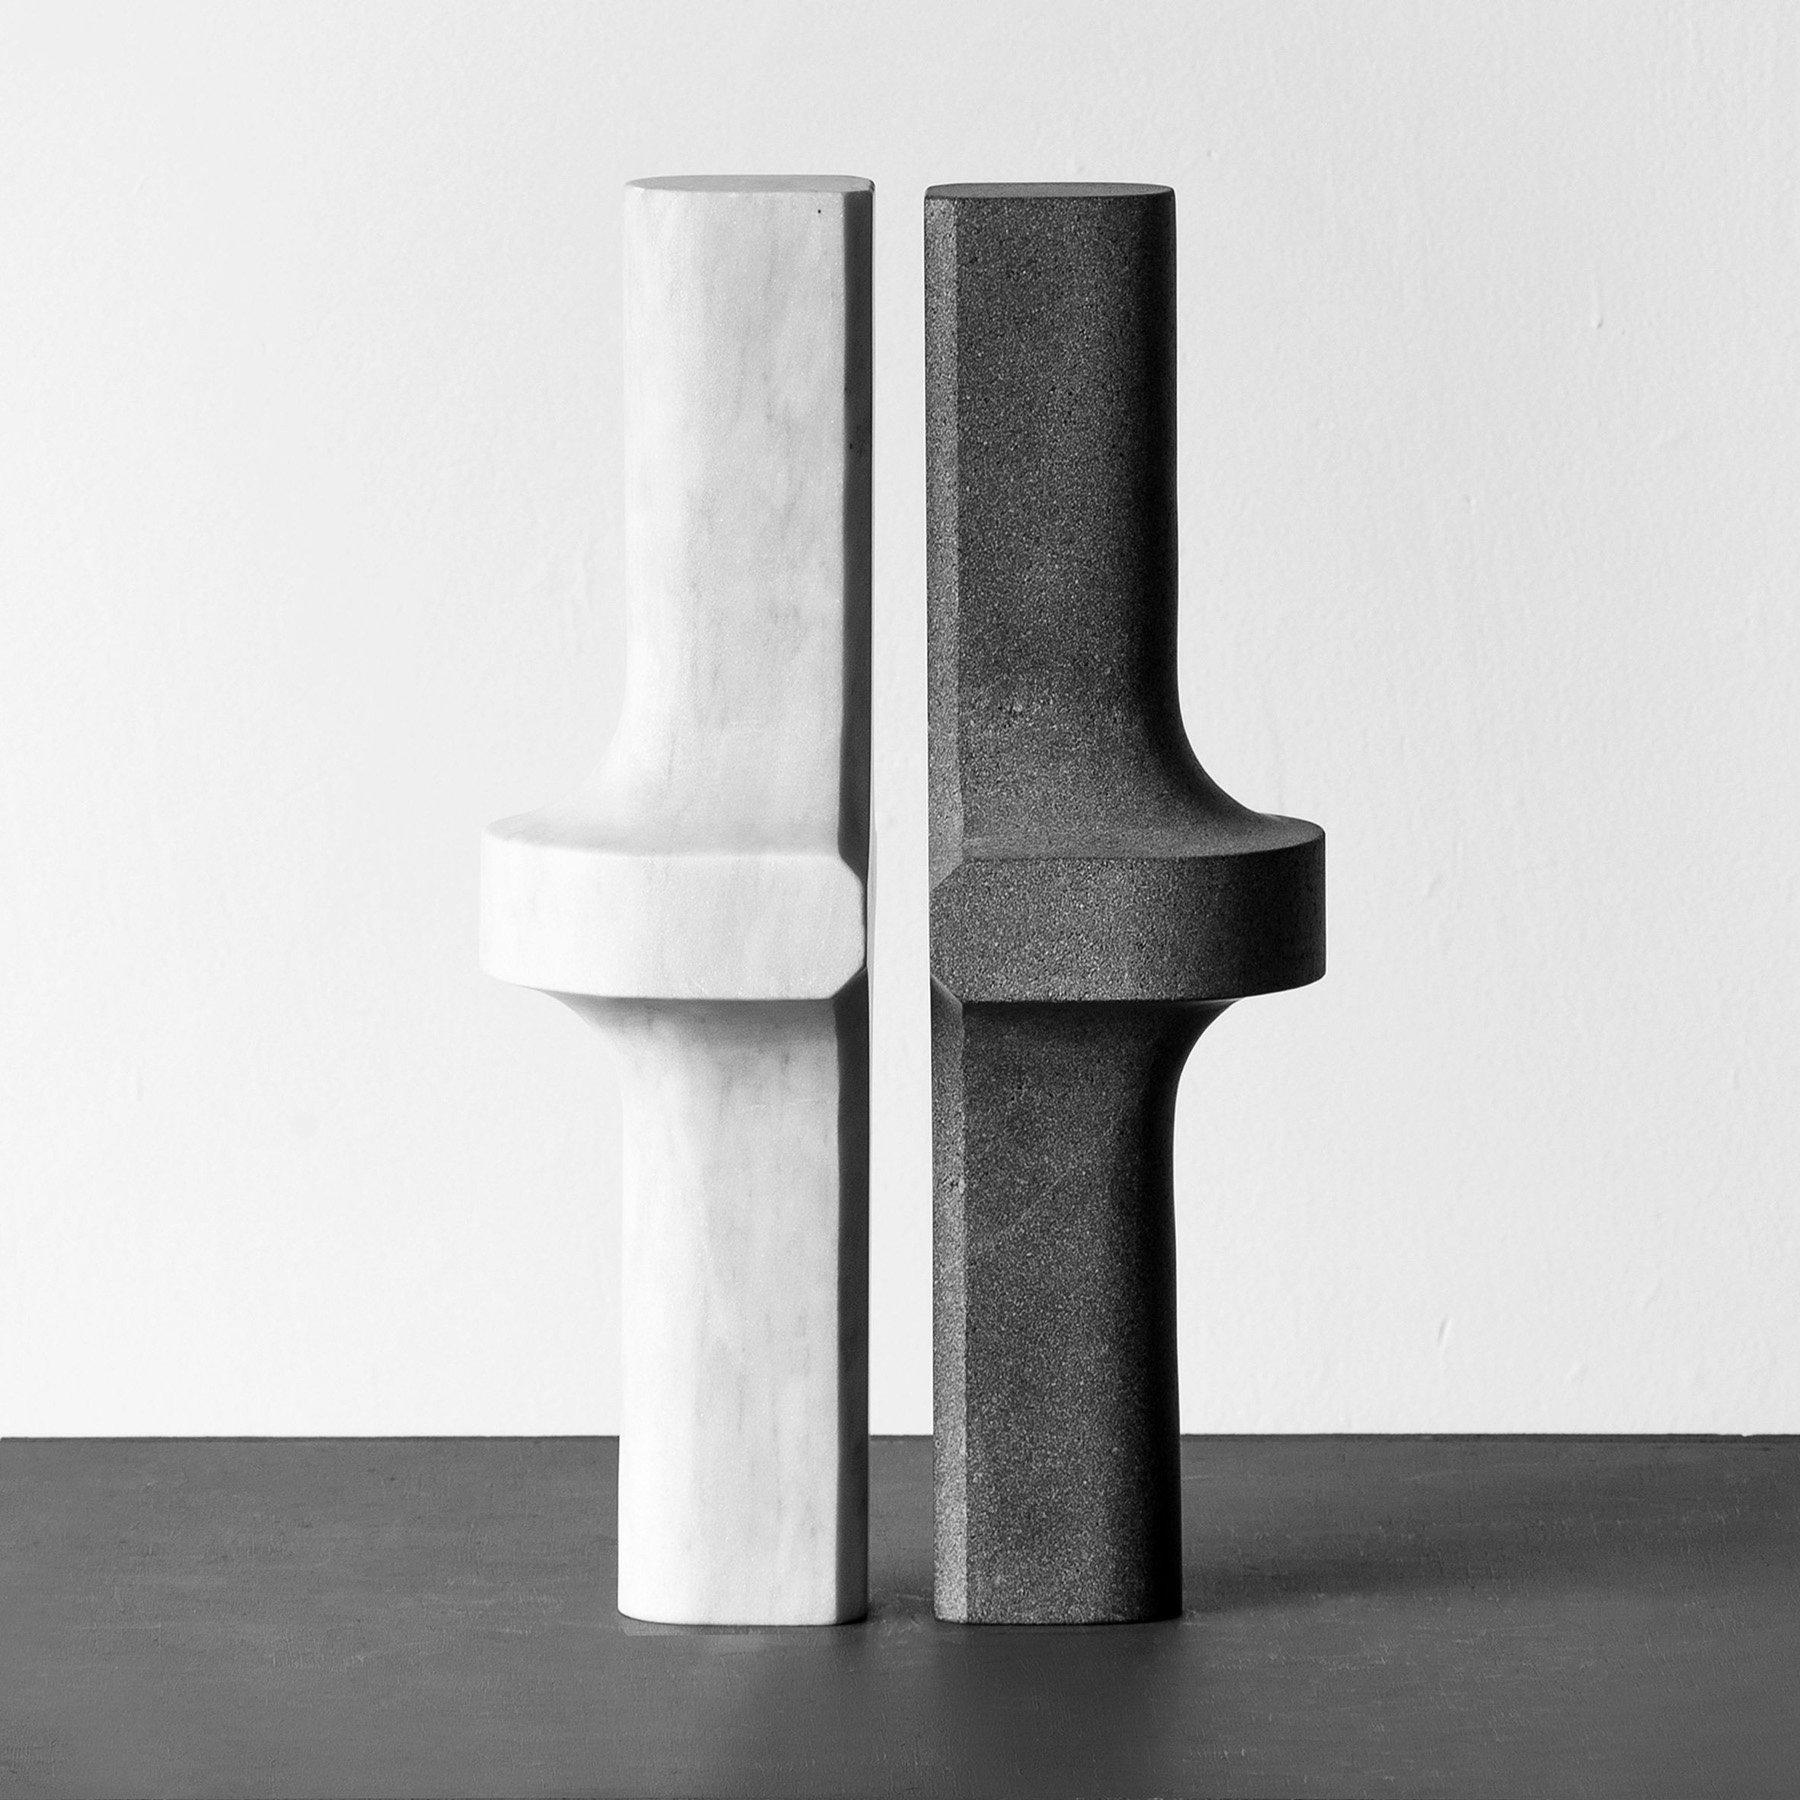 iGNANT-Design-EWE-Studio-Sacred-Ritual-Objects-03